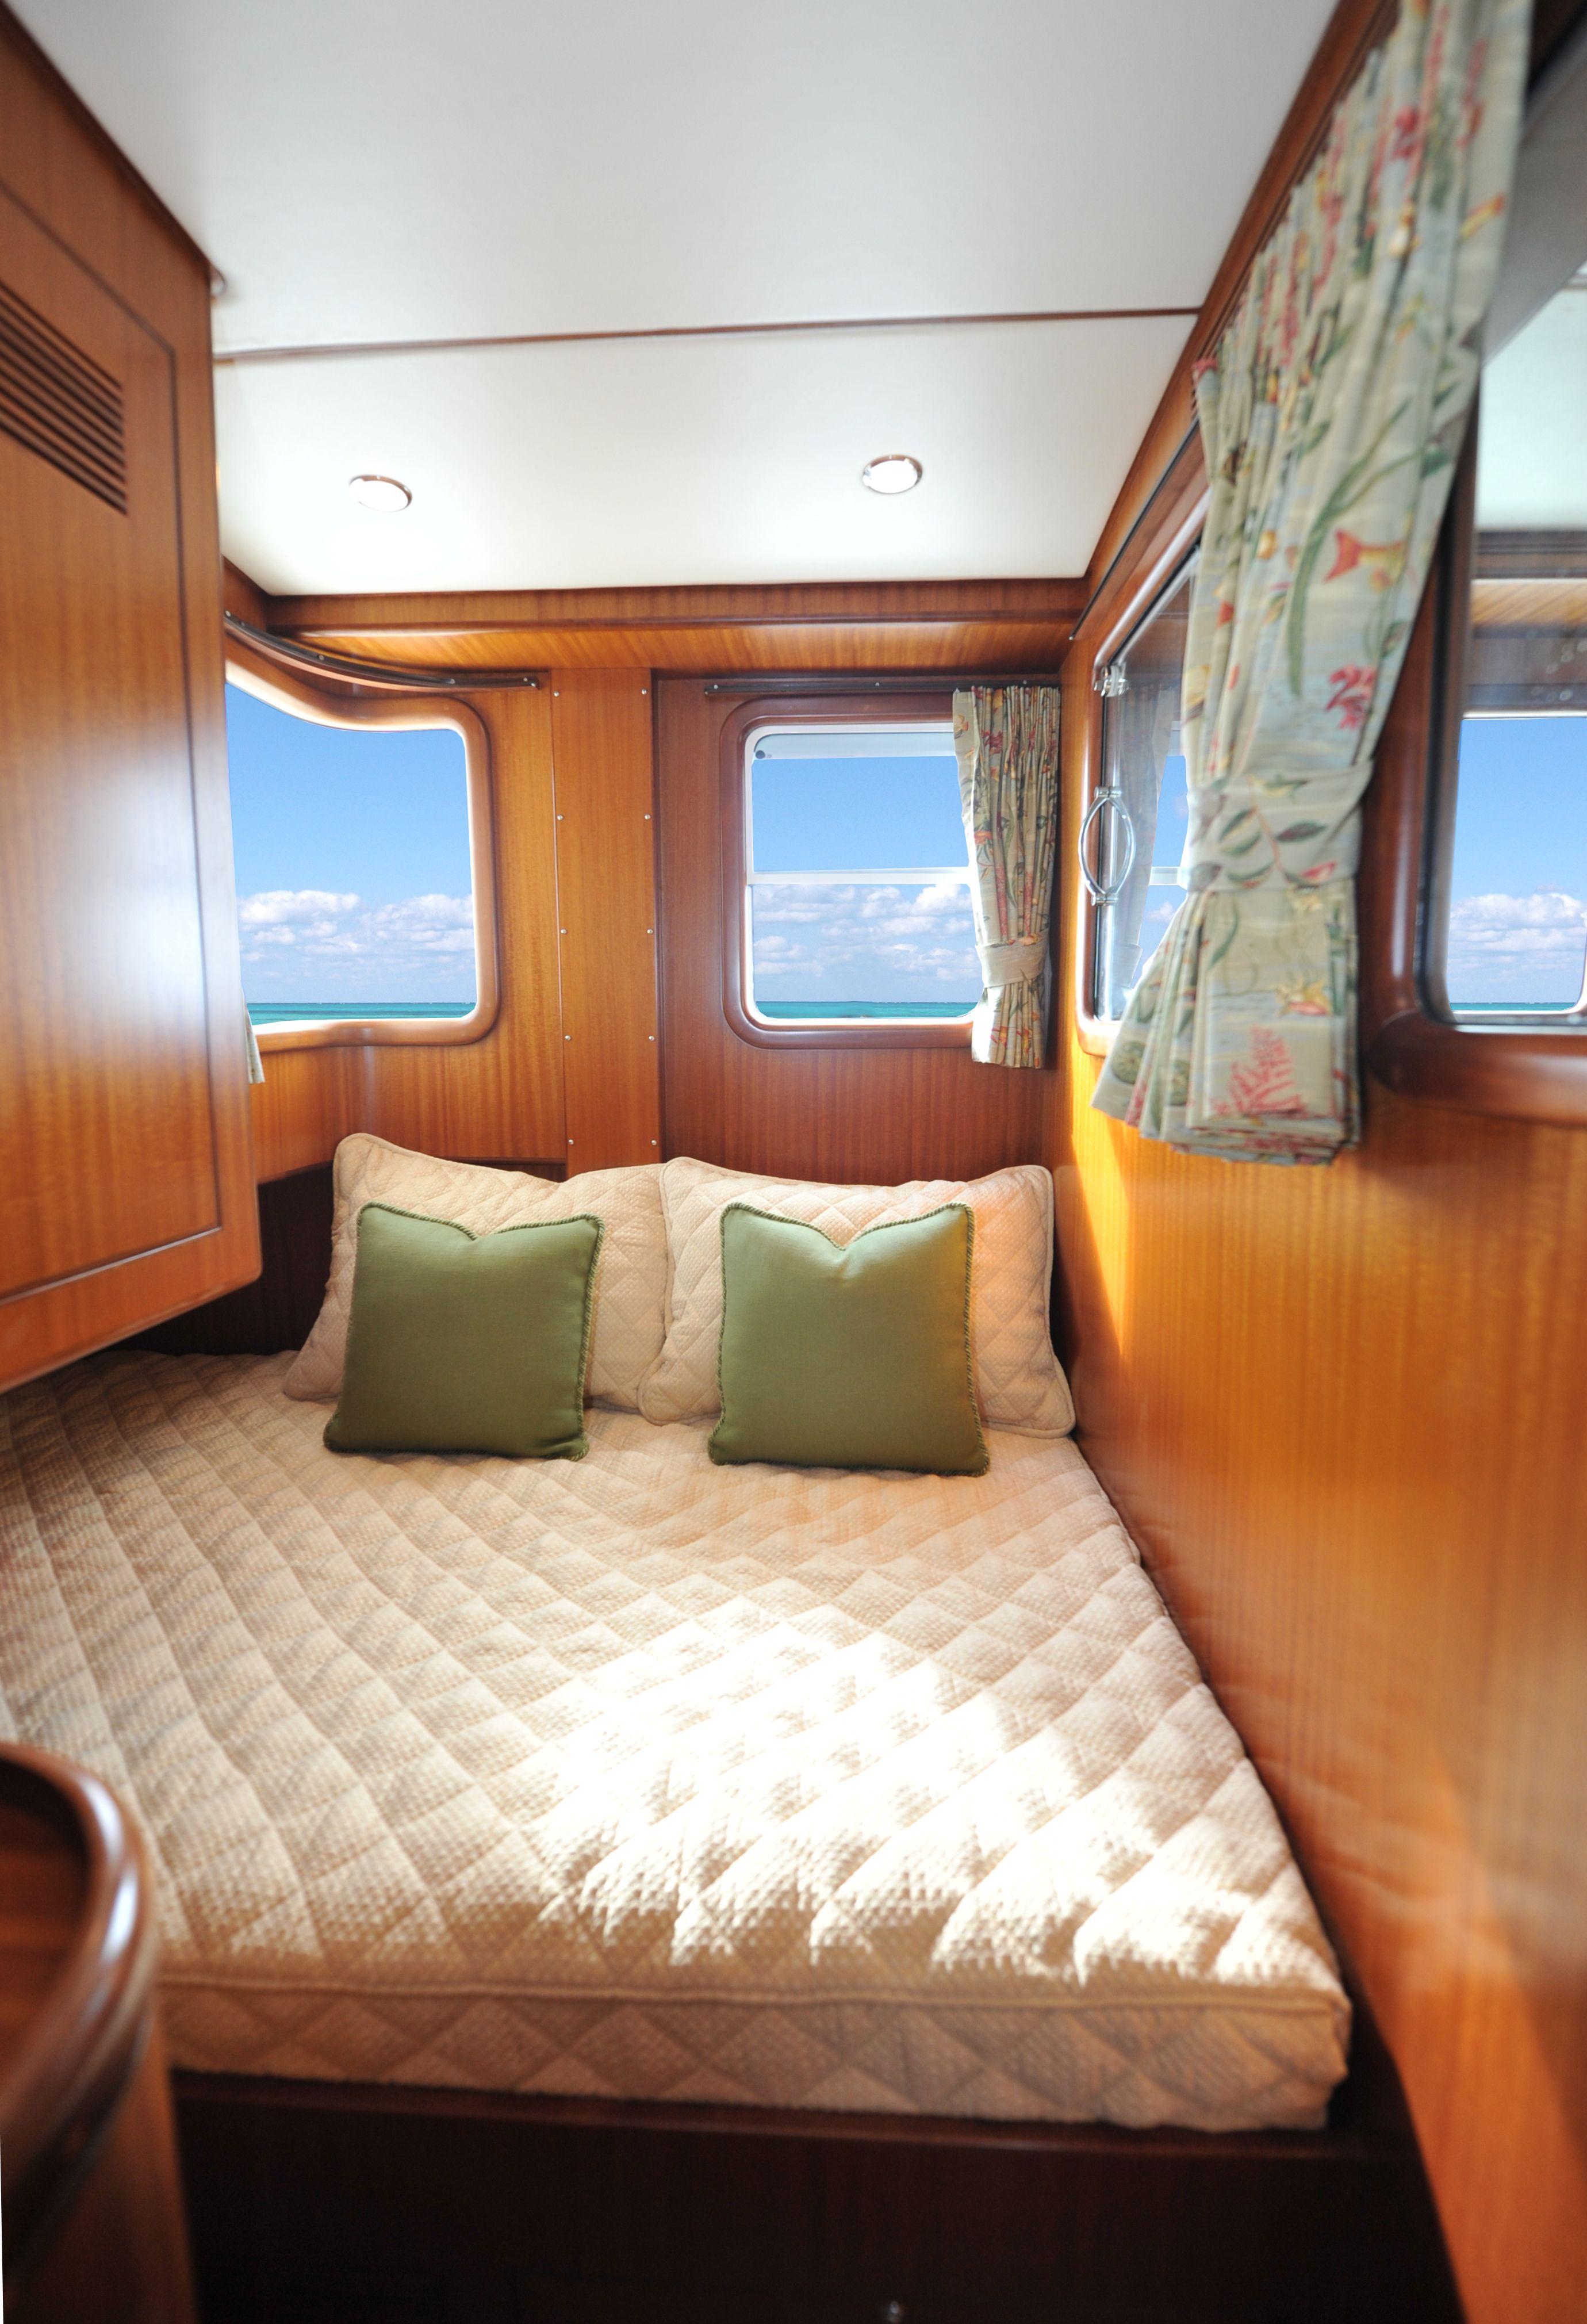 Nordhavn 55 Captains Cabin Custom Yacht Interior Design Destry Darr Designs